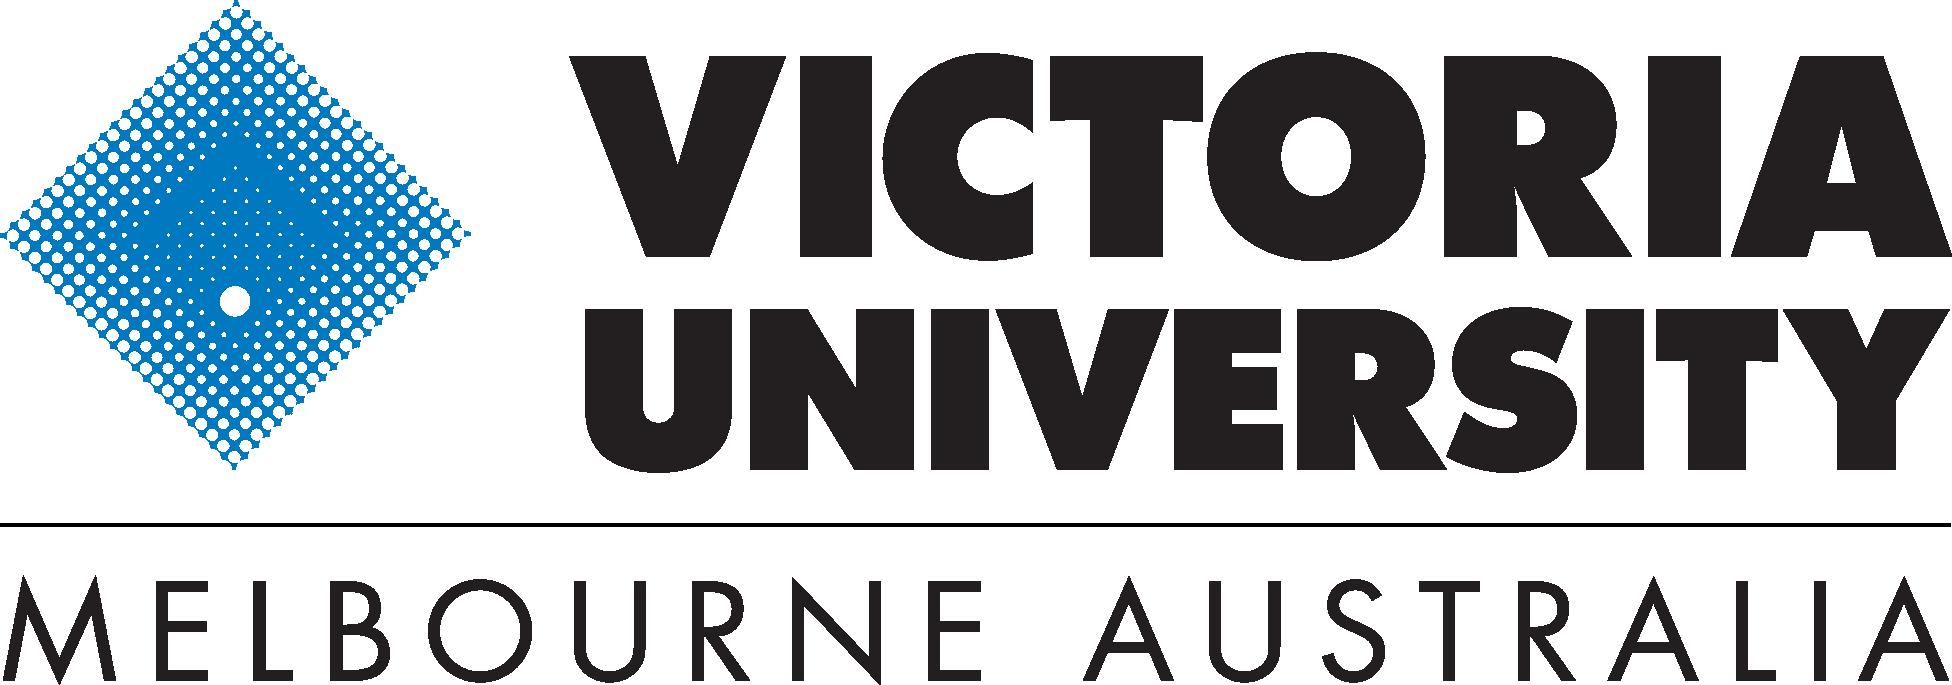 Victoria-University-logo-stacked-CMYK.png